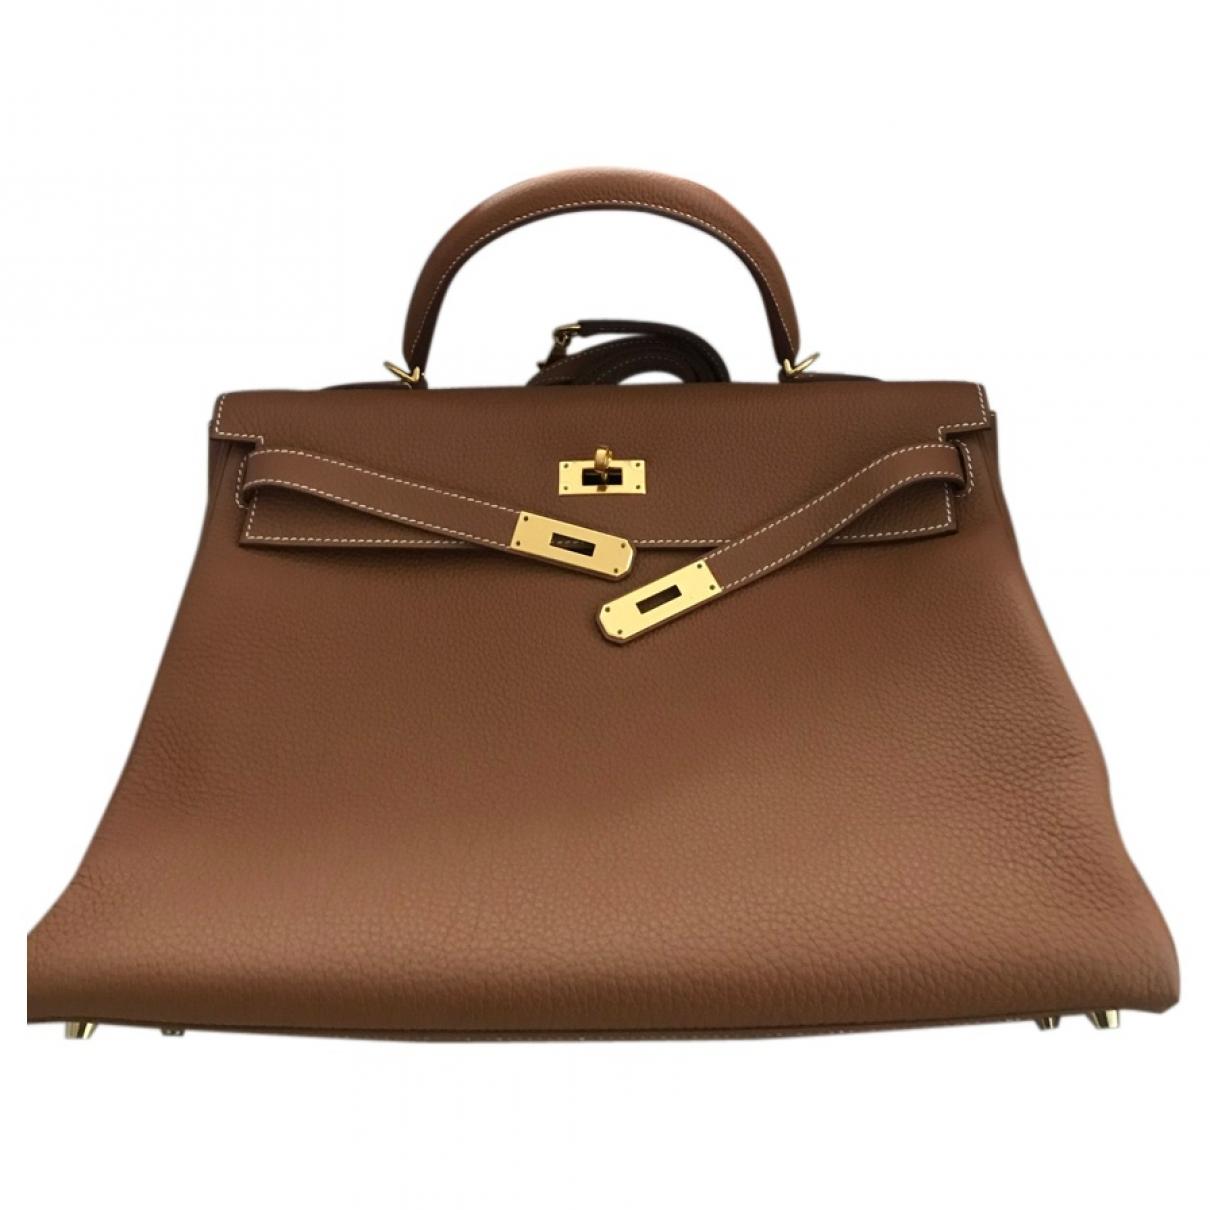 Hermes - Sac a main Kelly 32 pour femme en cuir - marron